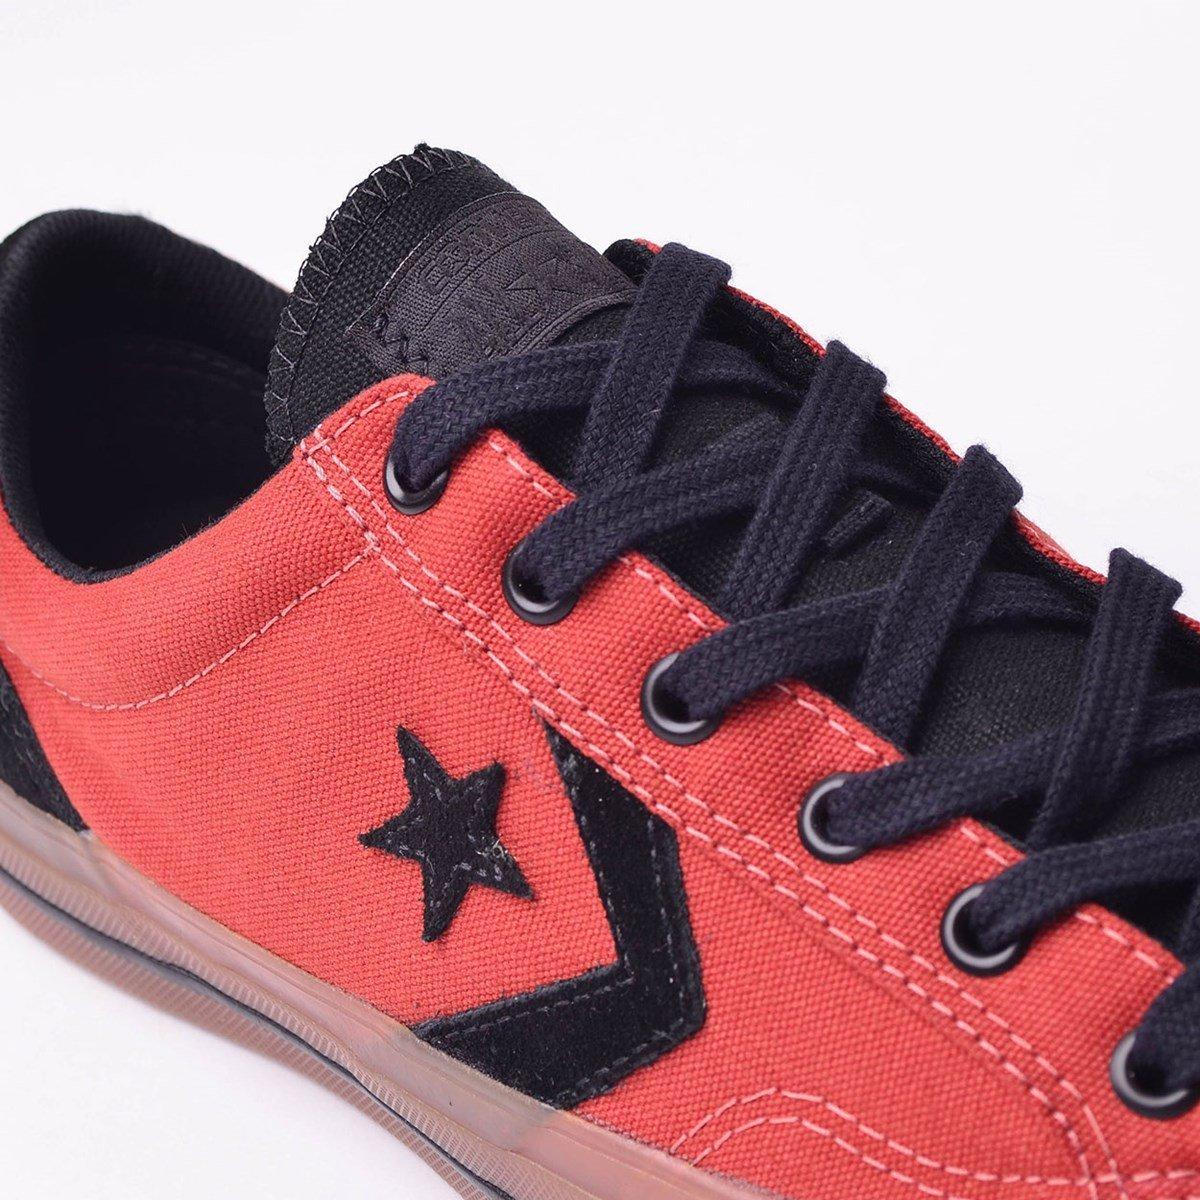 e Tênis Player Preto Converse Vermelho Tênis Star Converse YB7w4